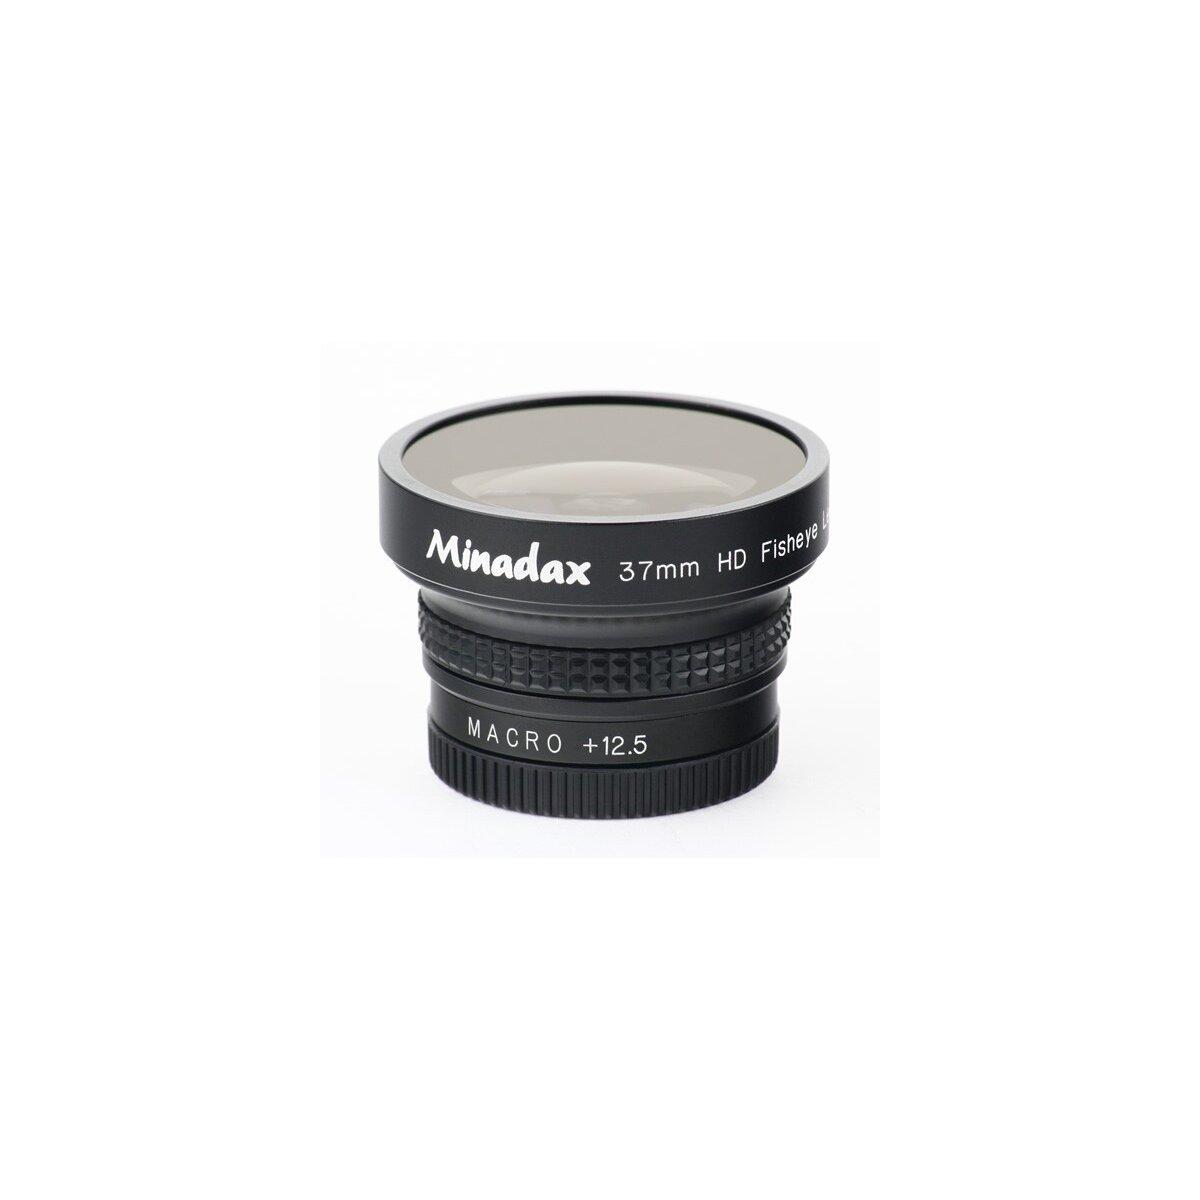 0.42x Minadax Fisheye Vorsatz kompatibel mit Sony HDR-CX105, HDR-CX106, HDR-CX115, HDR-CX116, HDR-CX155, HDR-CX305, HDR-CX350, HDR-HC3, HDR-SR1, HDR-SR10, HDR-UX1, HDR-UX9, HDR-UX19, HDR-XR105, HDR-XR106, HDR-XR155, HDR-XR200, DCR-SR30, DCR-SR32